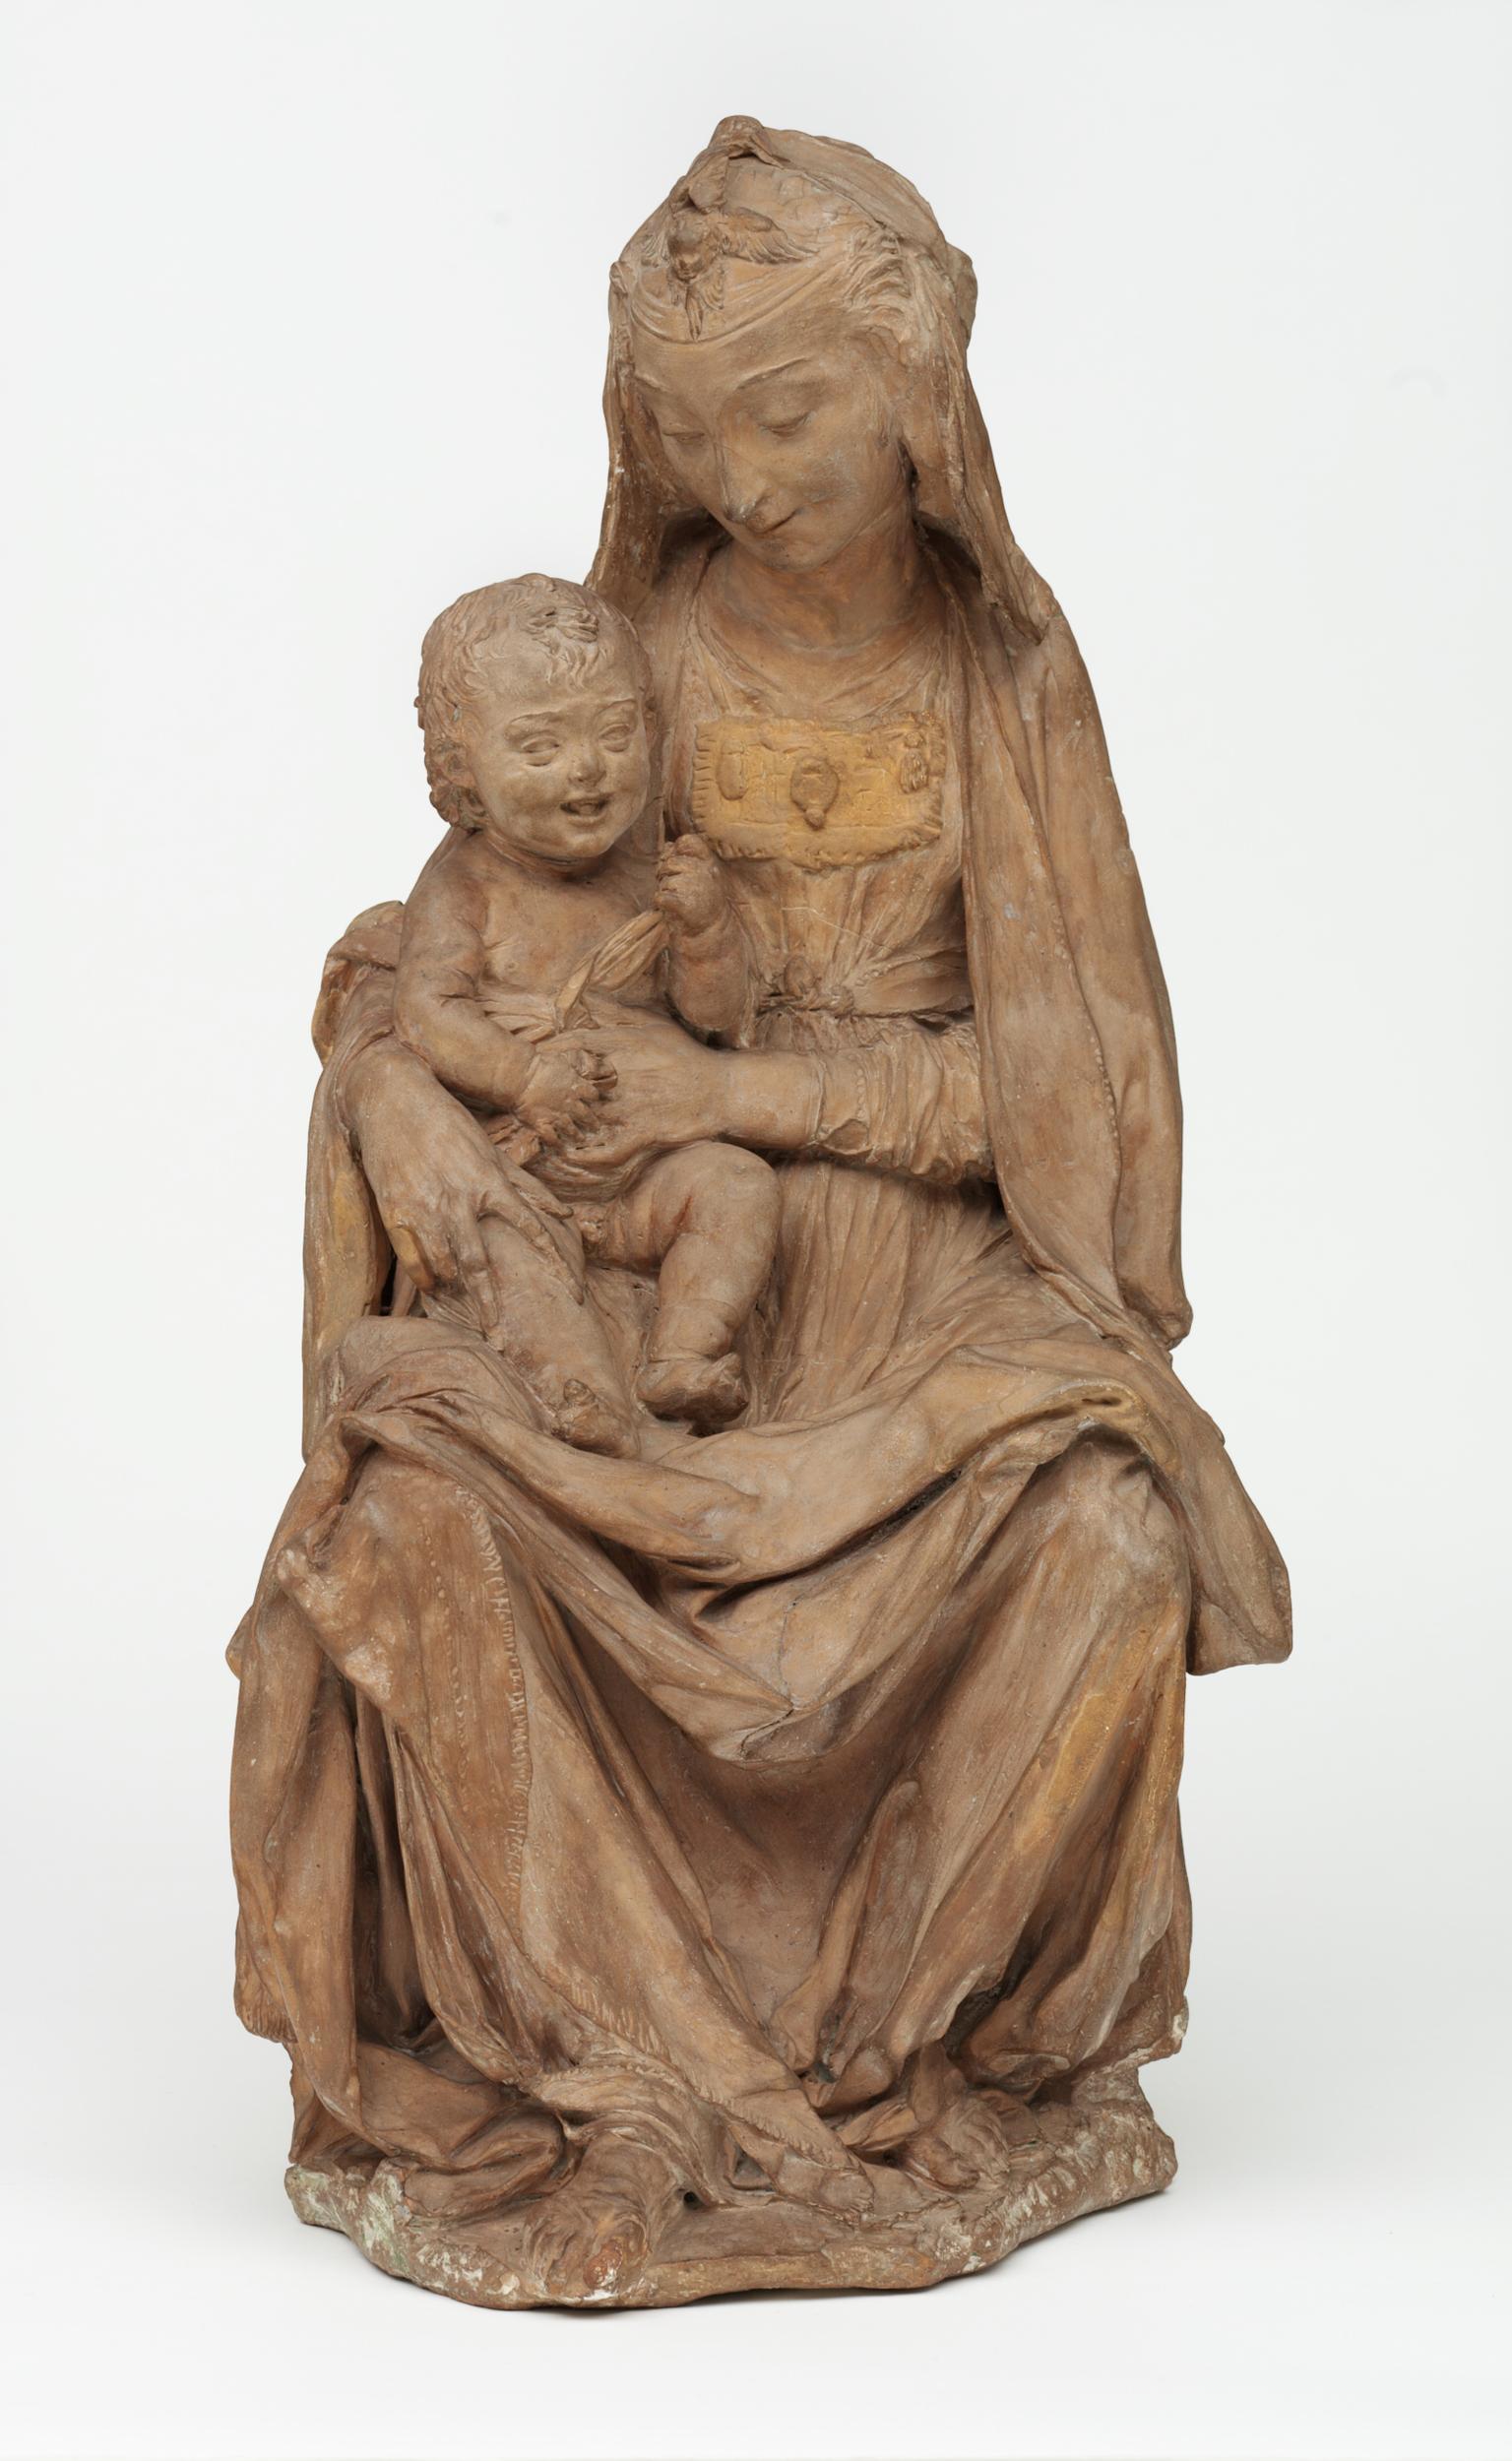 Antonio Rossellino/Leonardo, Madonna col Bambino (terracotta, 49 x 27 x 24,5 cm; Londra, Victoria and Albert Museum)